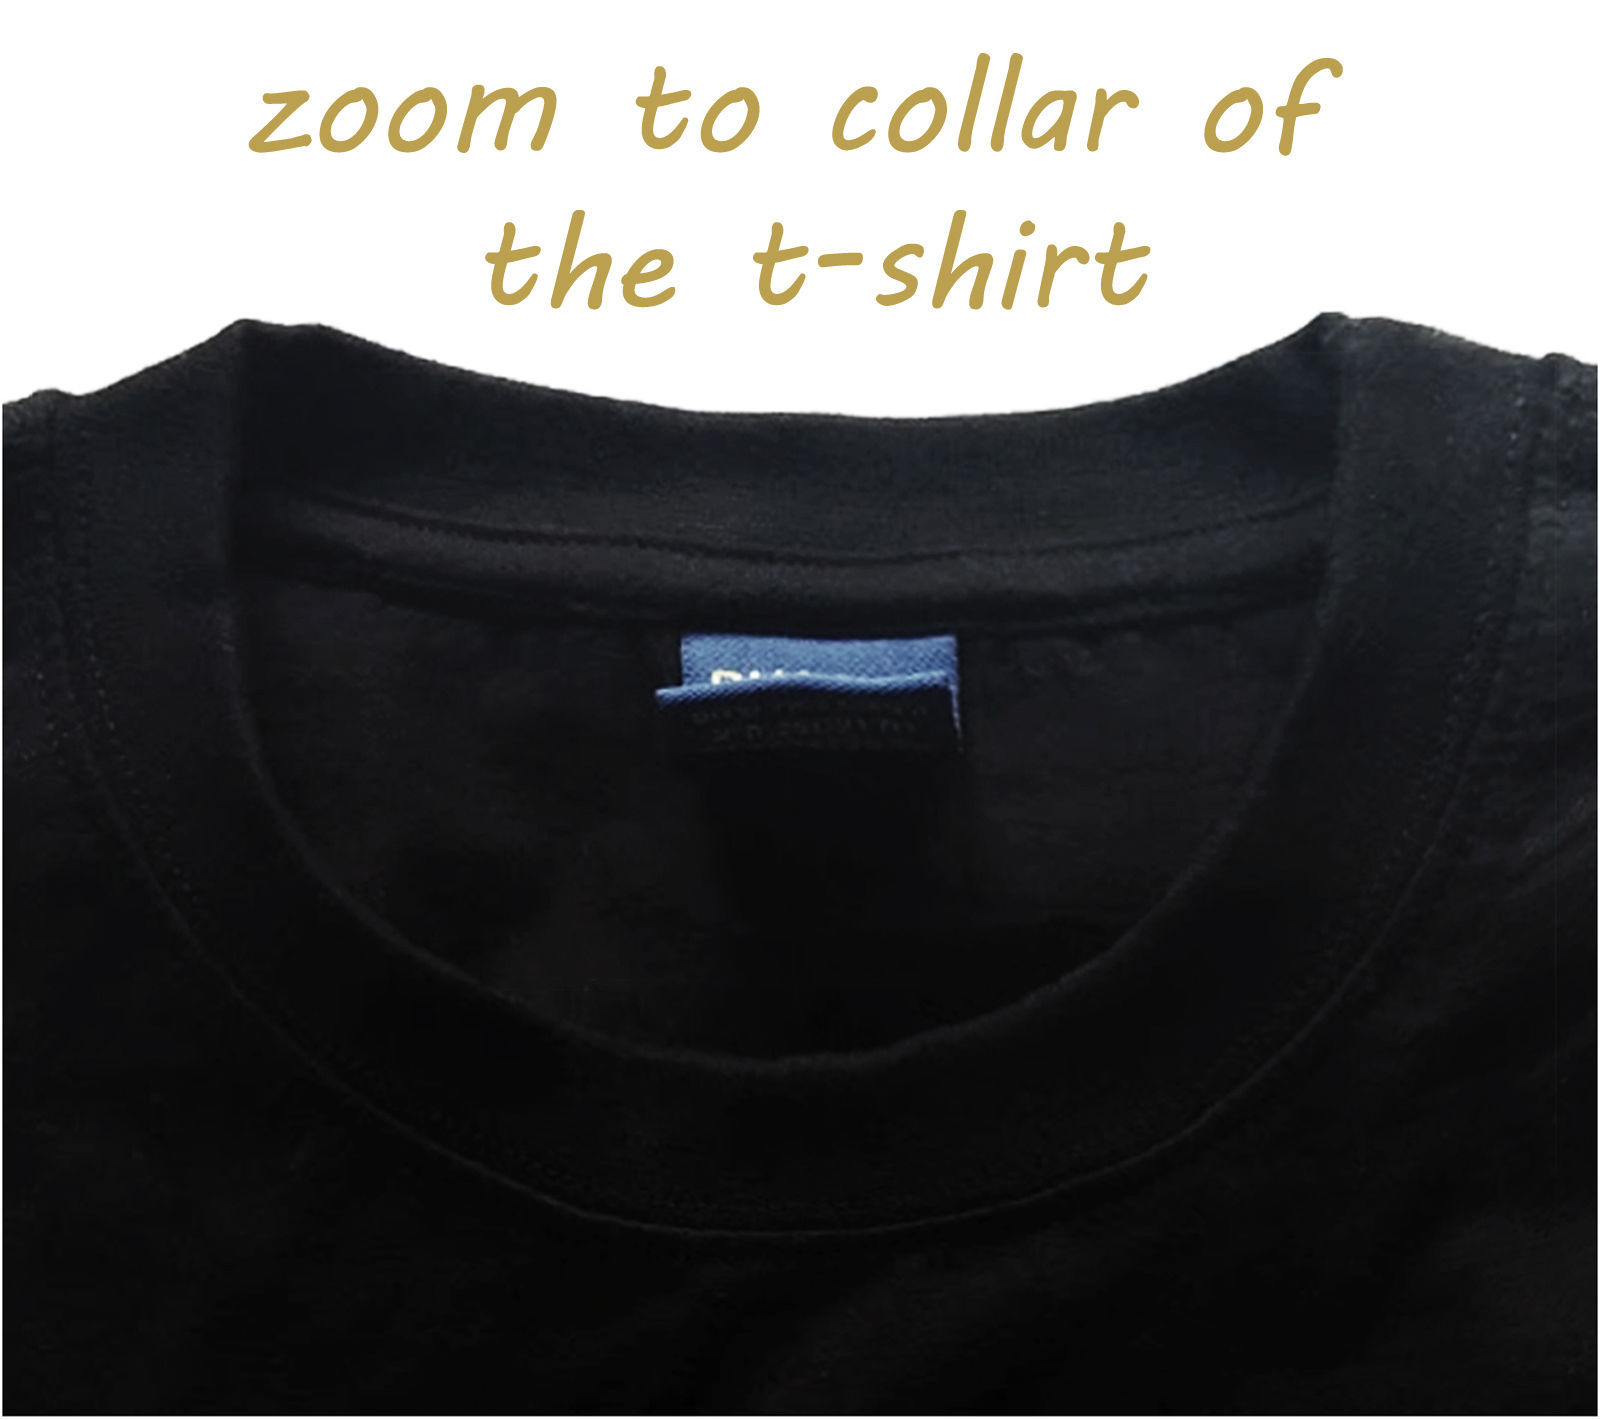 Mycooltee Martial Arts Judo Japanese Script Emblem 100/% Cotton Sleeved Black t-Shirt